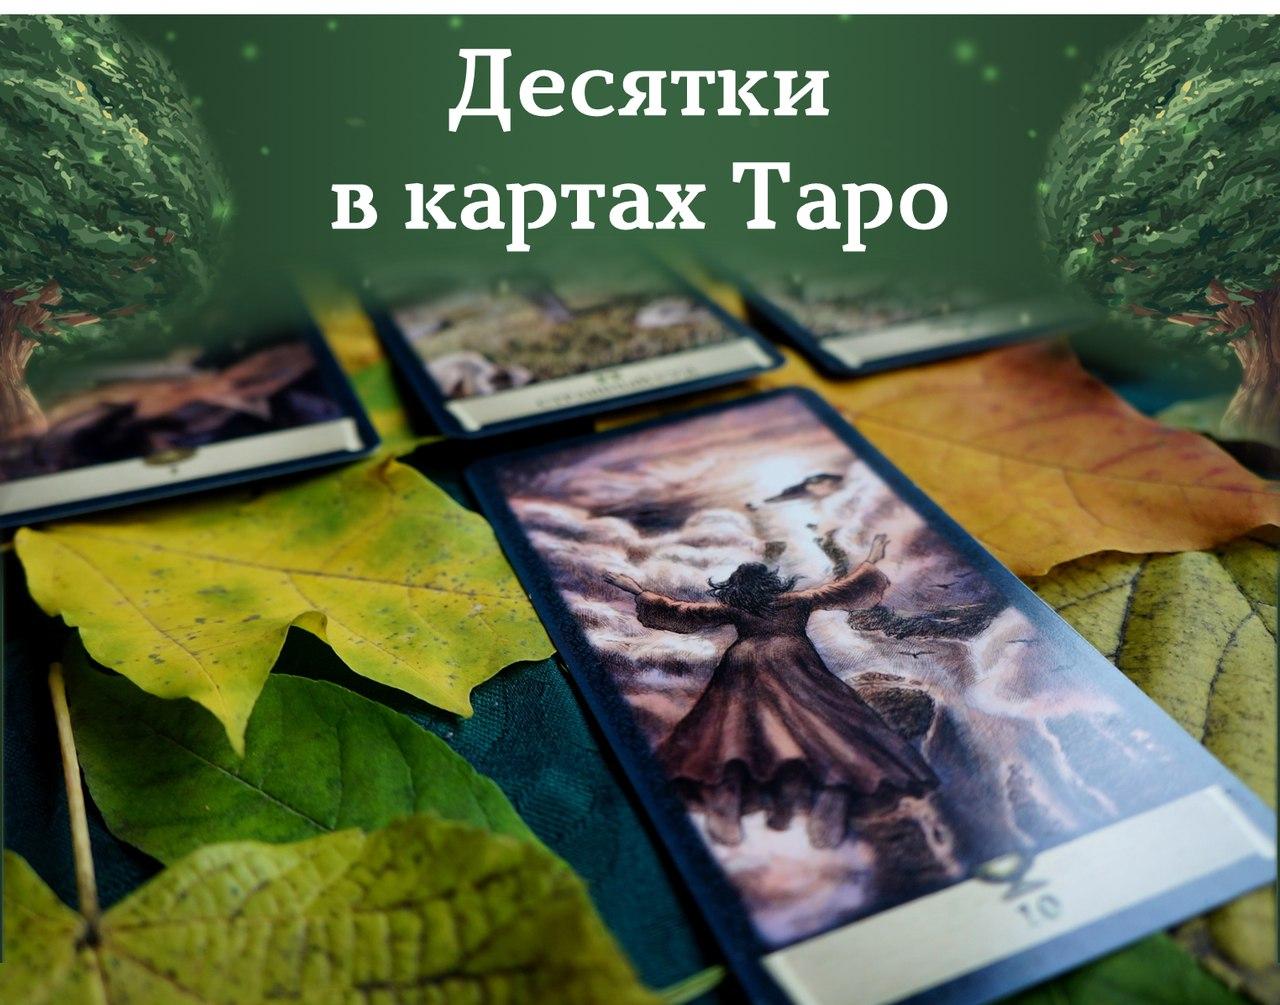 https://pp.userapi.com/c831309/v831309347/86239/PNlrjNI_W8s.jpg